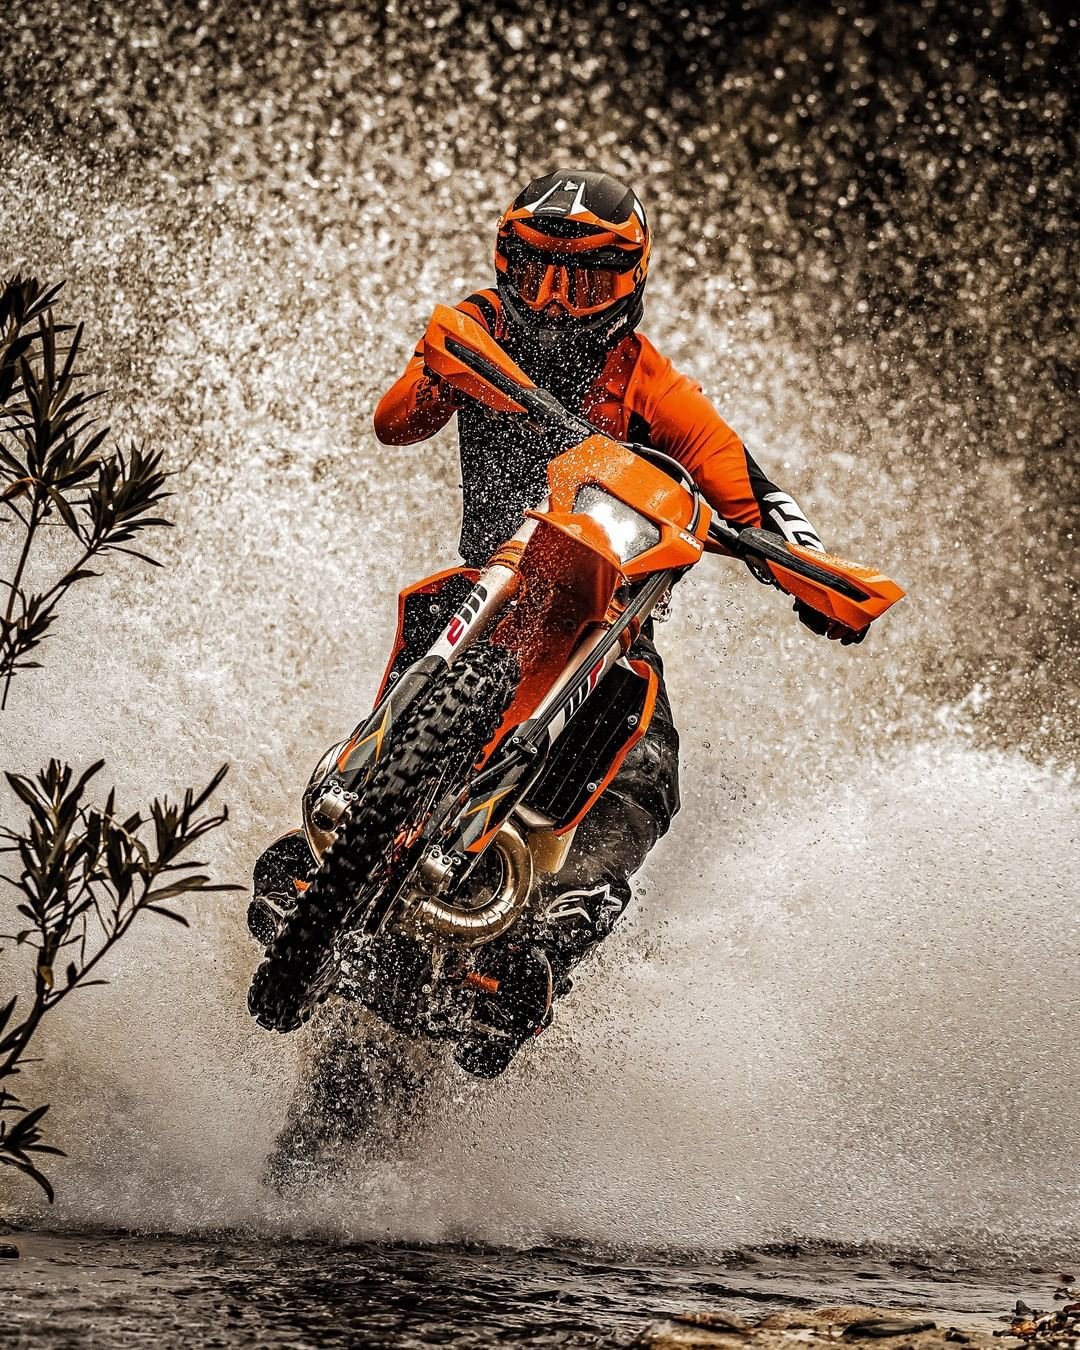 Ktm On Instagram Full Throttle Into Sunday Ktm 300 Exc Tpi Lightweight Nimble And At The Forefront Of Extreme Enduro Devel Ktm Enduro Ktm Motocross Bikes Download ktm exc wallpaper hd background